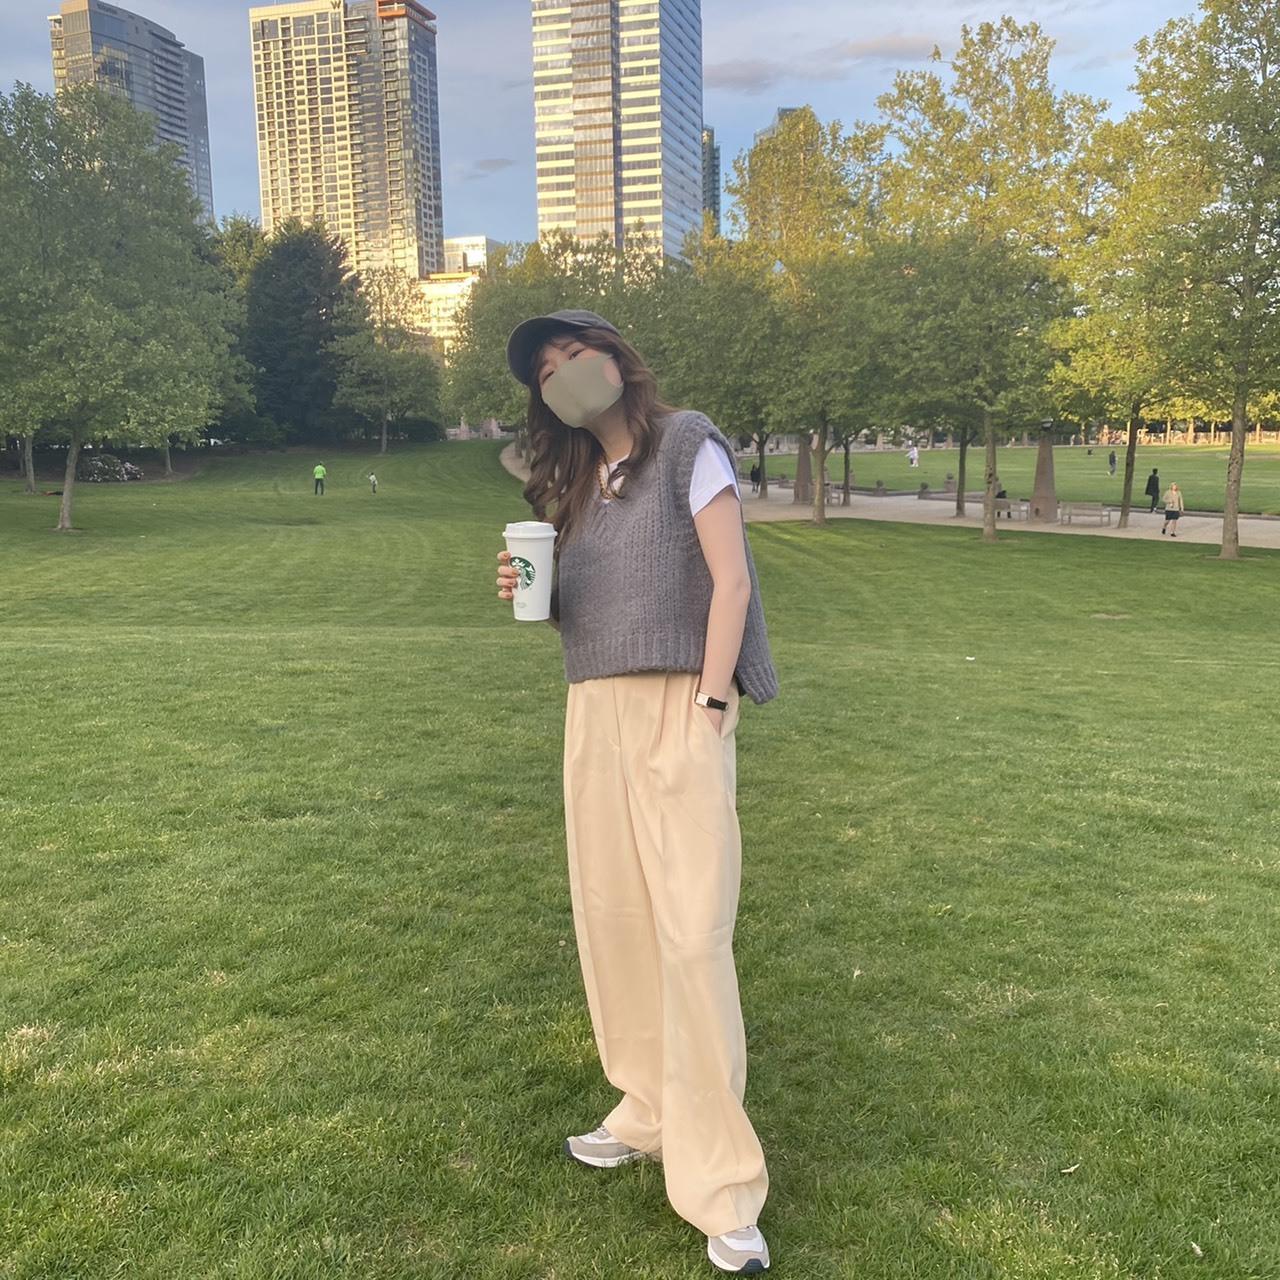 DAYNYC mild pants